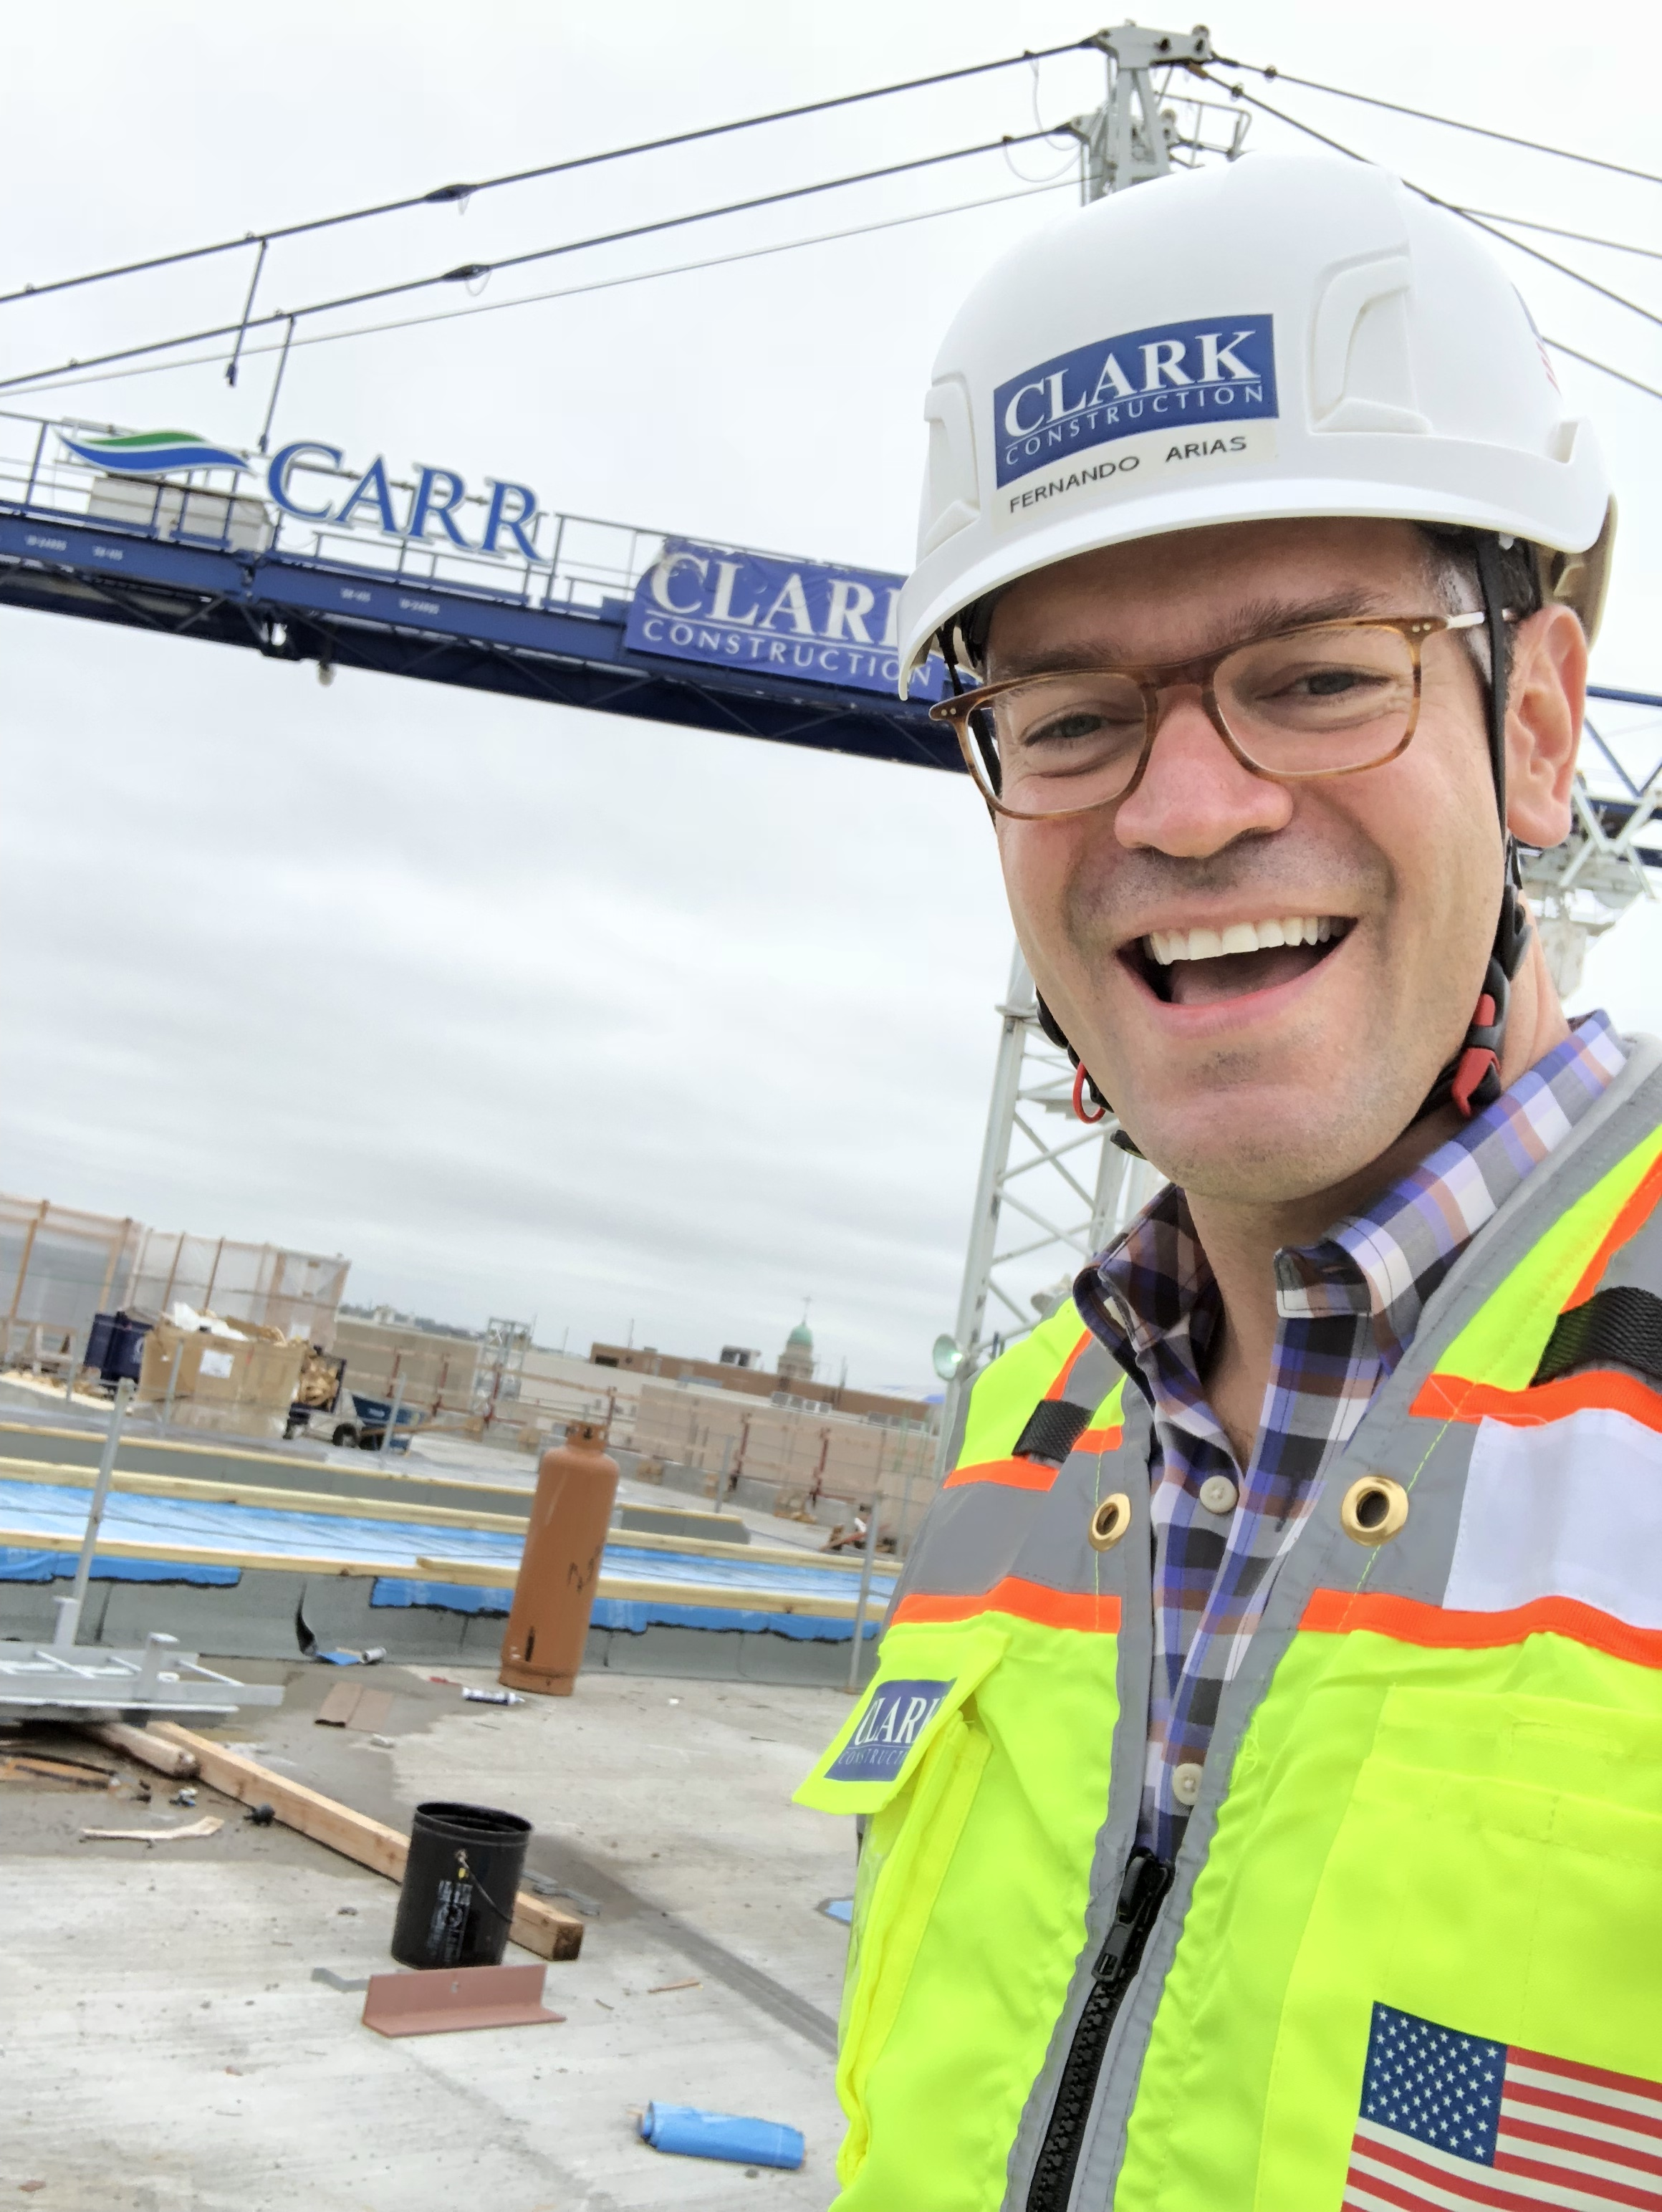 Fernando Arias Clark Construction Group